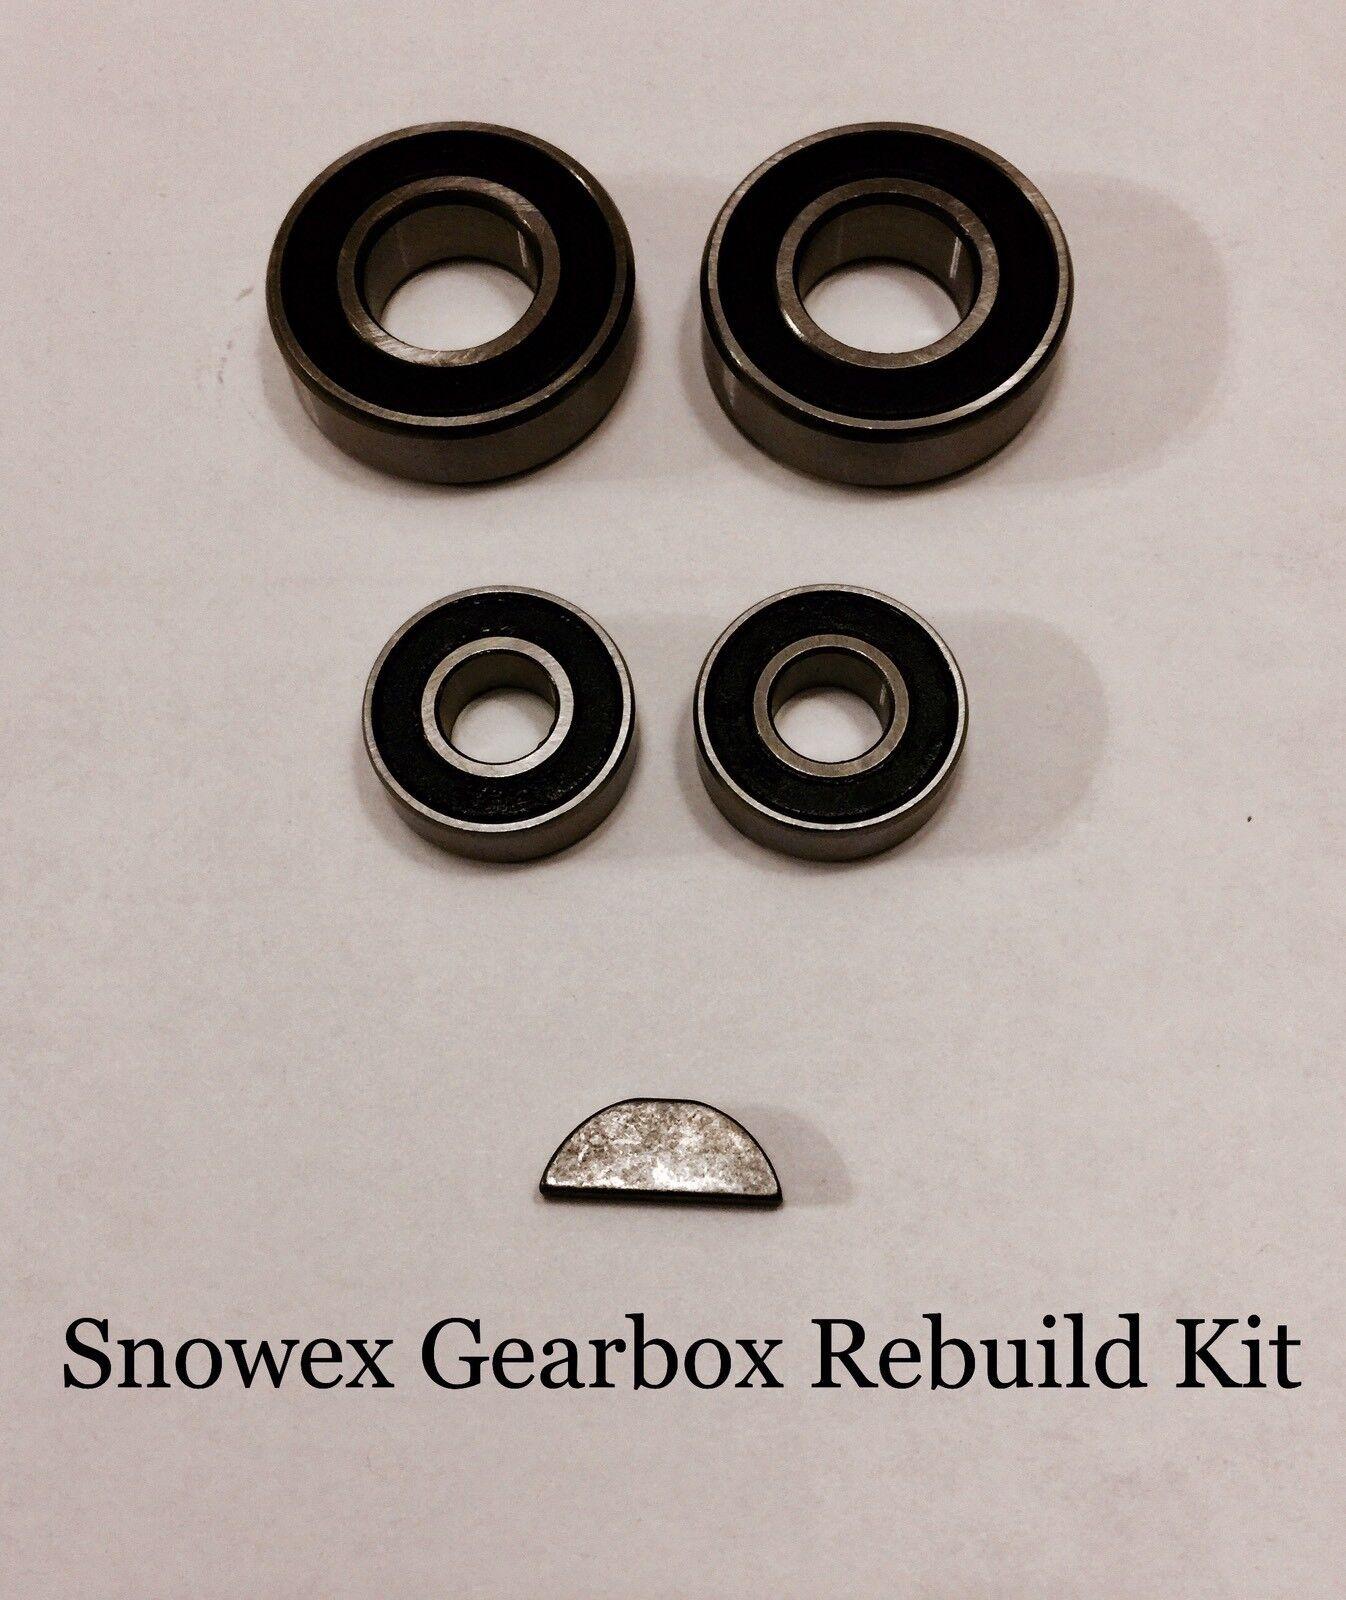 Snowex D6107 Transmission Rebuild Kit Sp 575 1075 Salt Spreader Wiring Harness Norton Secured Powered By Verisign